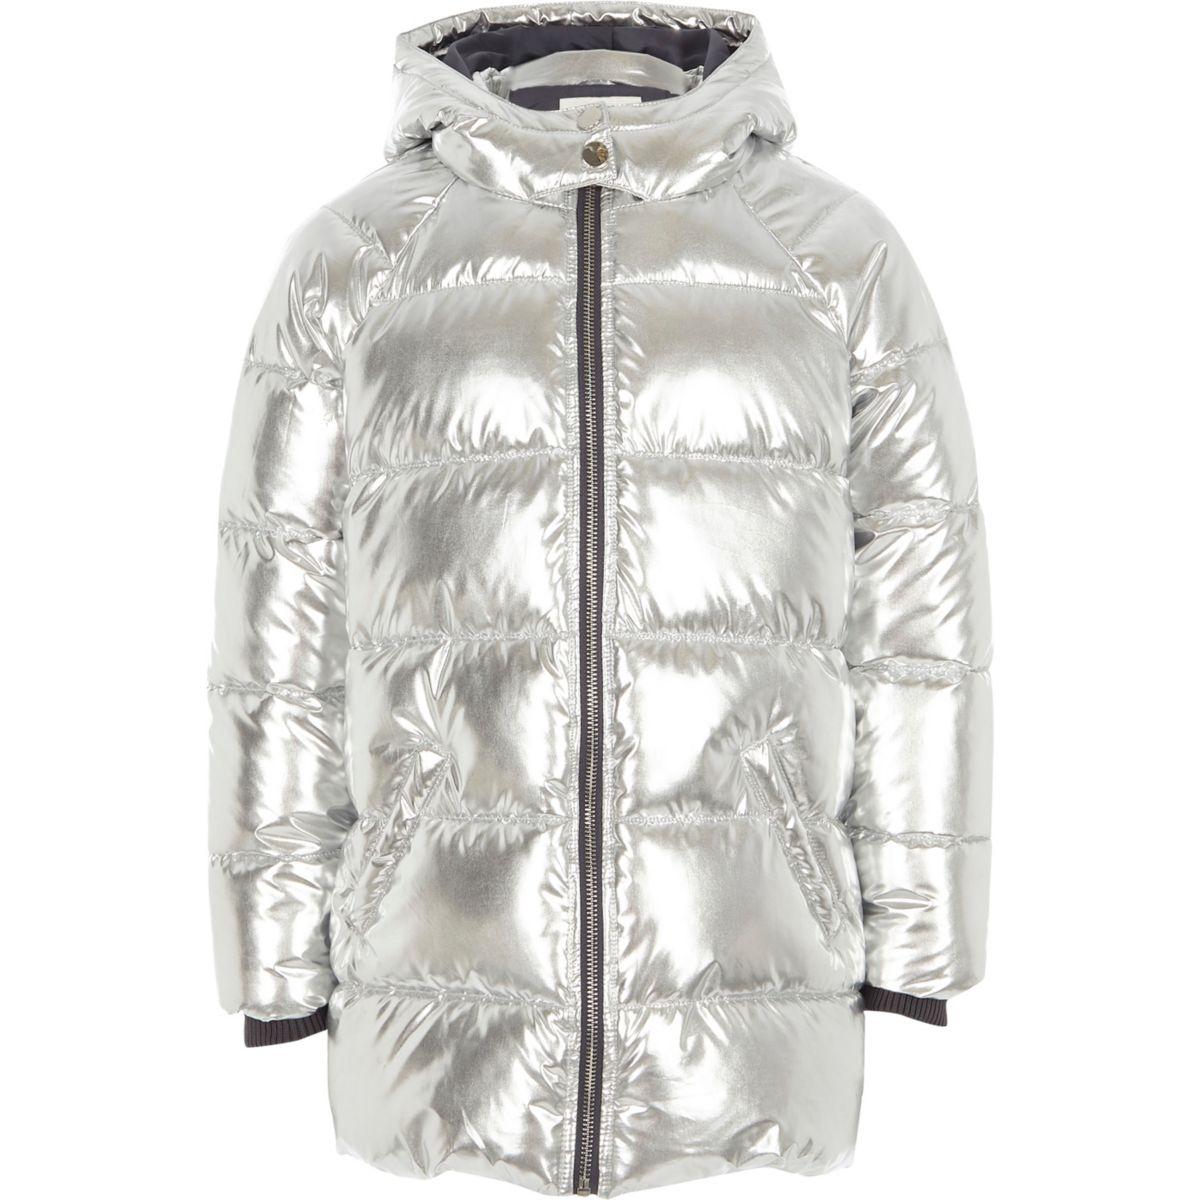 Girls silver foil hooded puffer coat